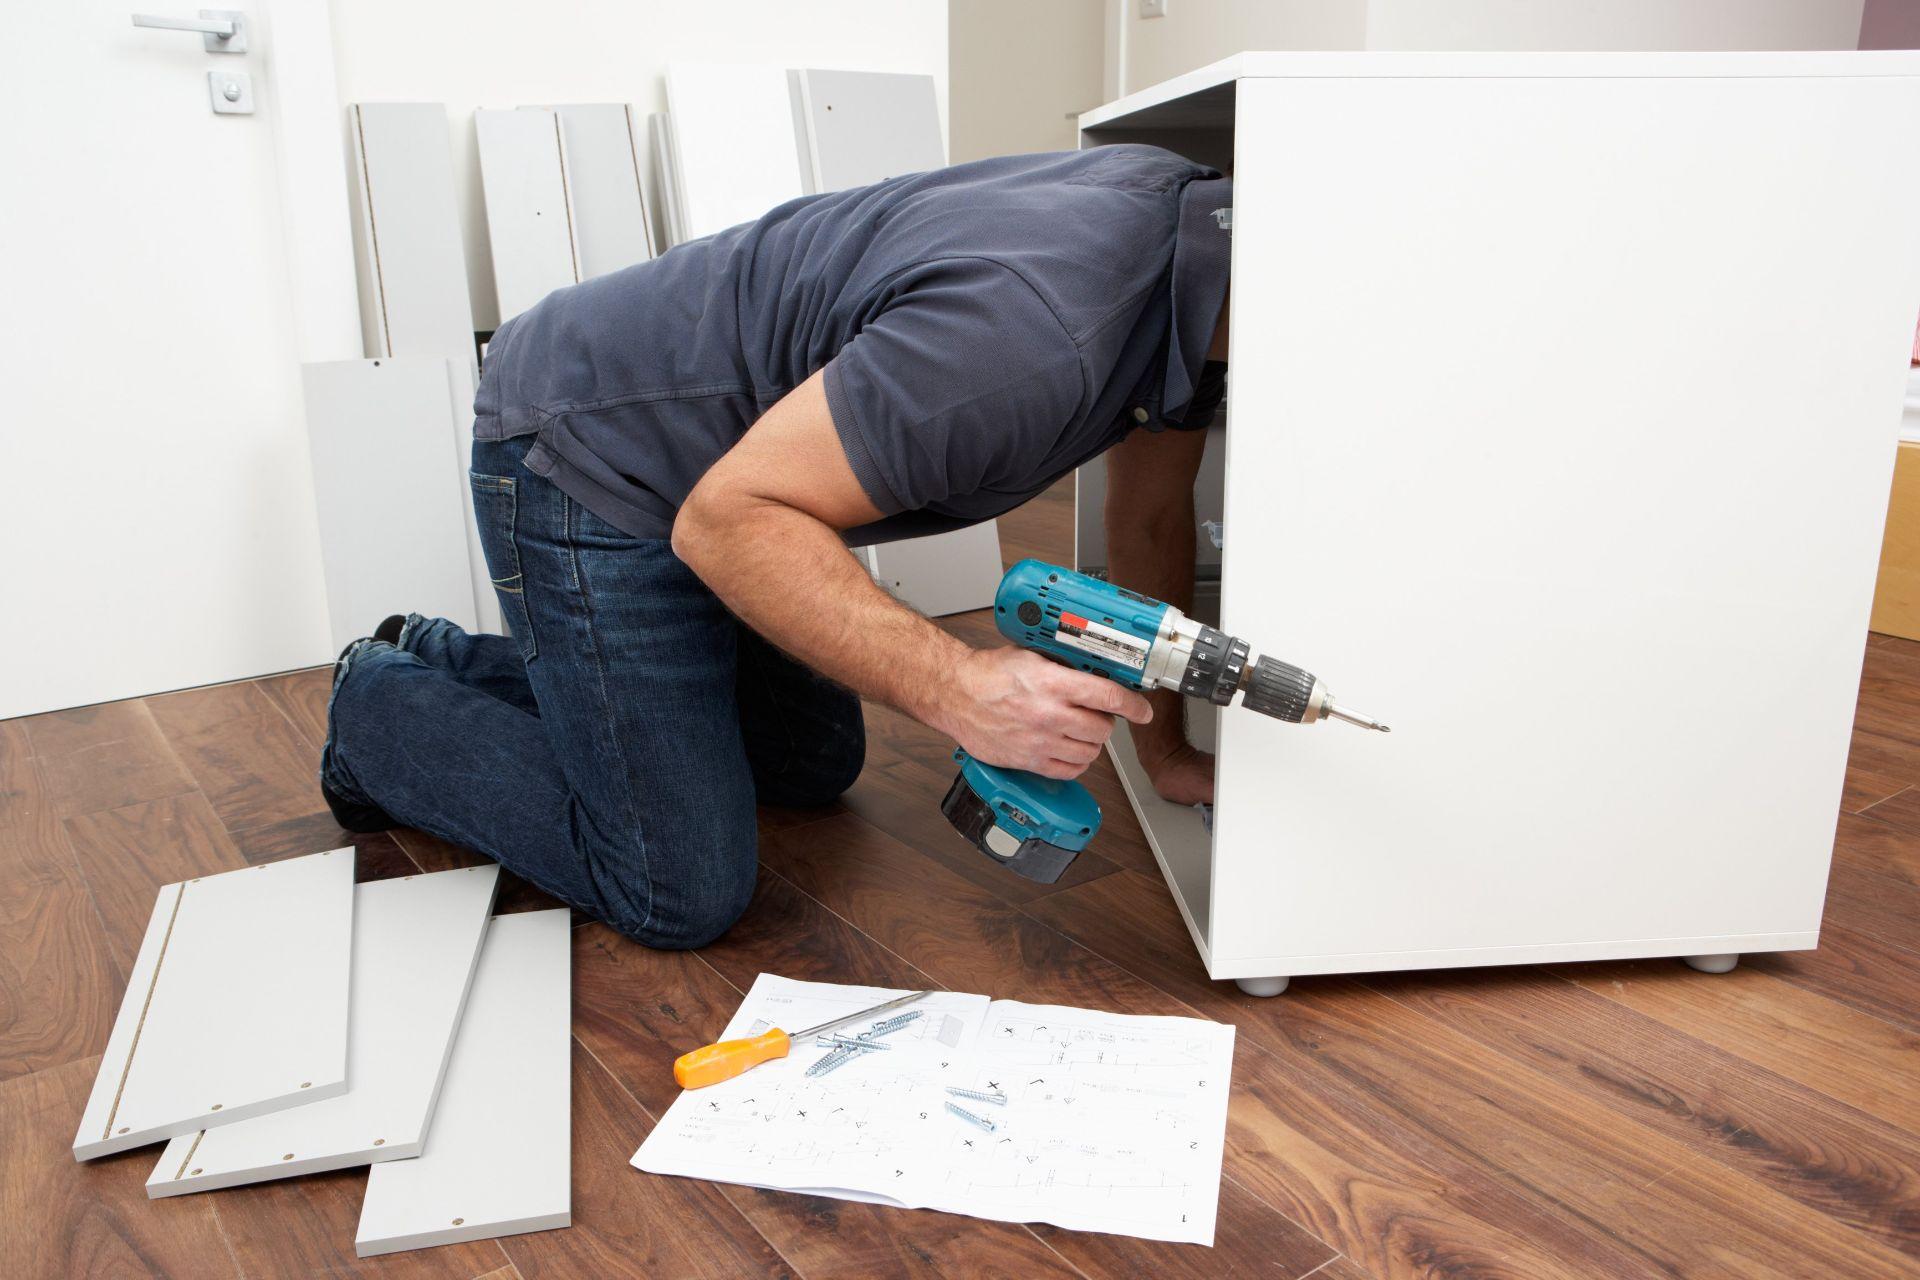 Assembling other IKEA furniture